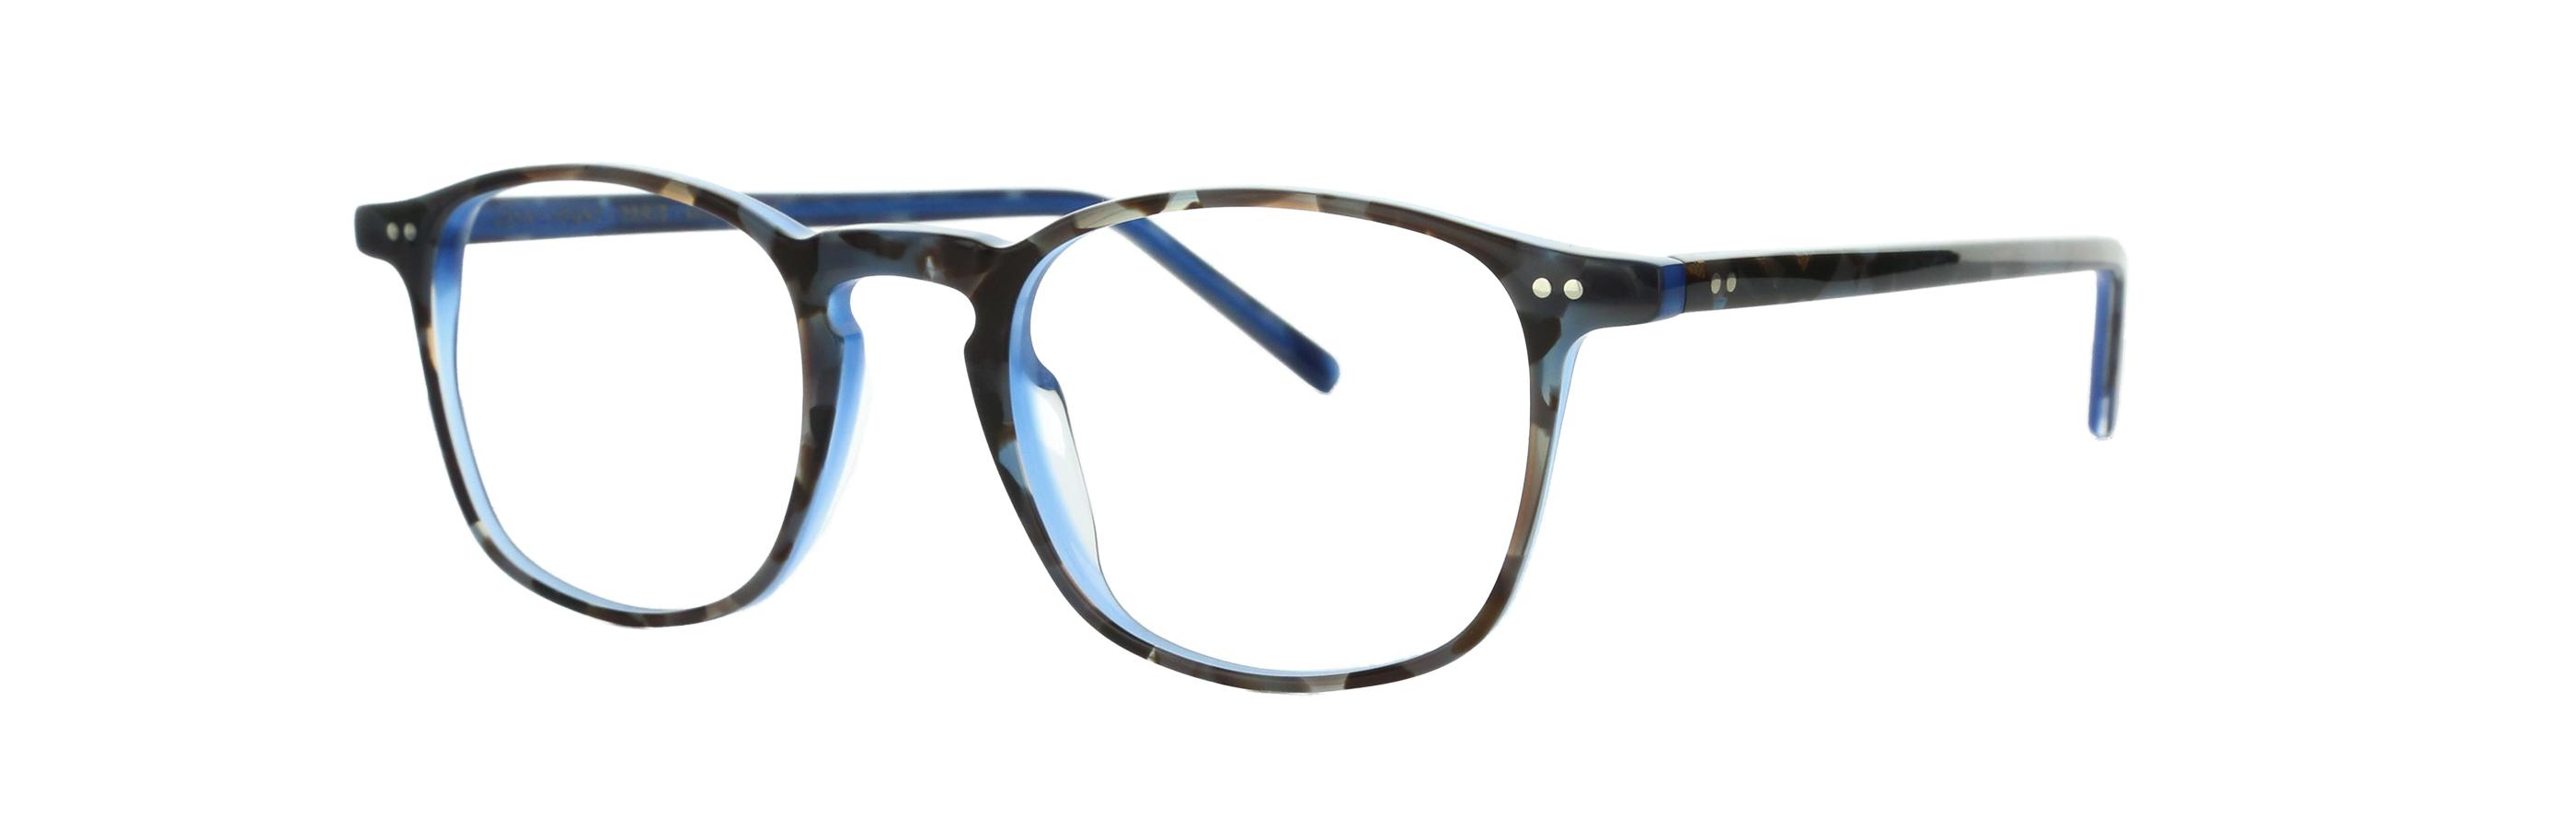 Lafont TRADITION Eyeglasses